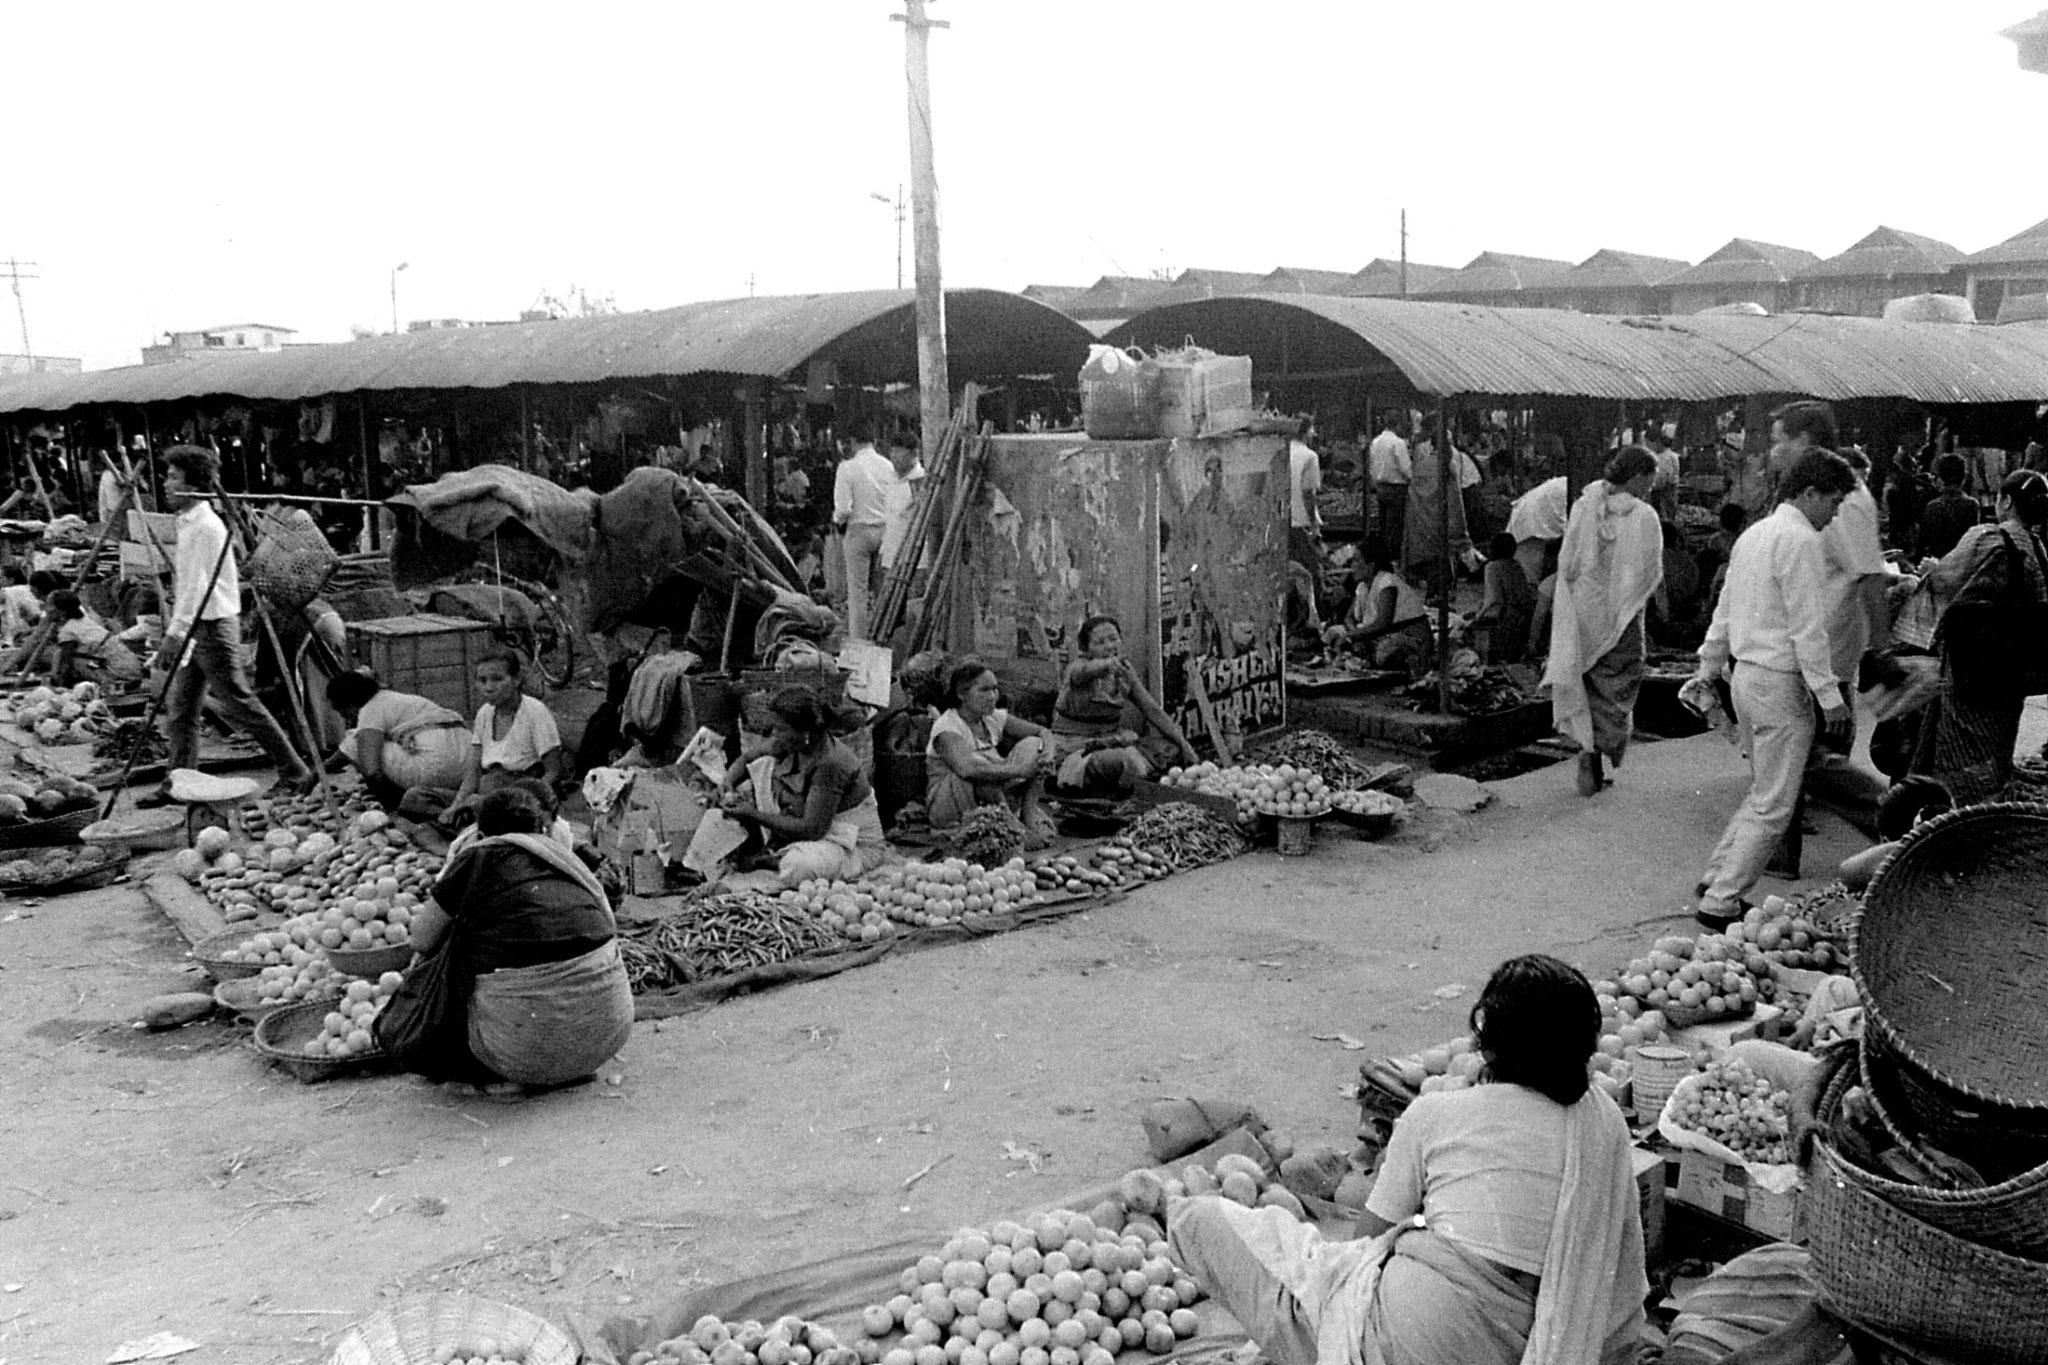 17/4/1990: 12: Imphal women's market